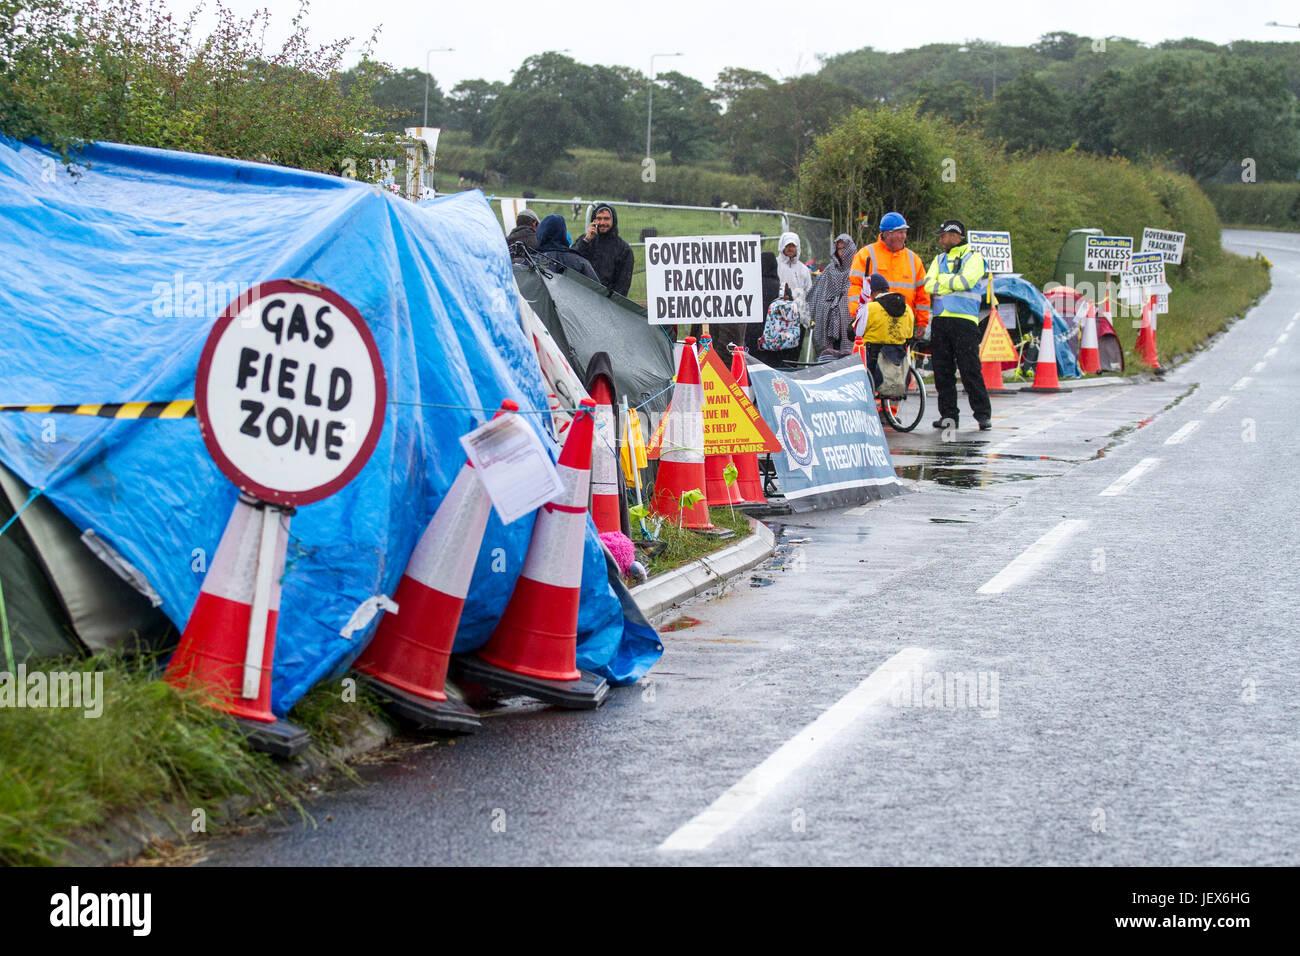 Blackpool, Lancashire, 28th June 2017. Fracking Protest continues.  Anti-fracking protesters continue to demonstrate - Stock Image